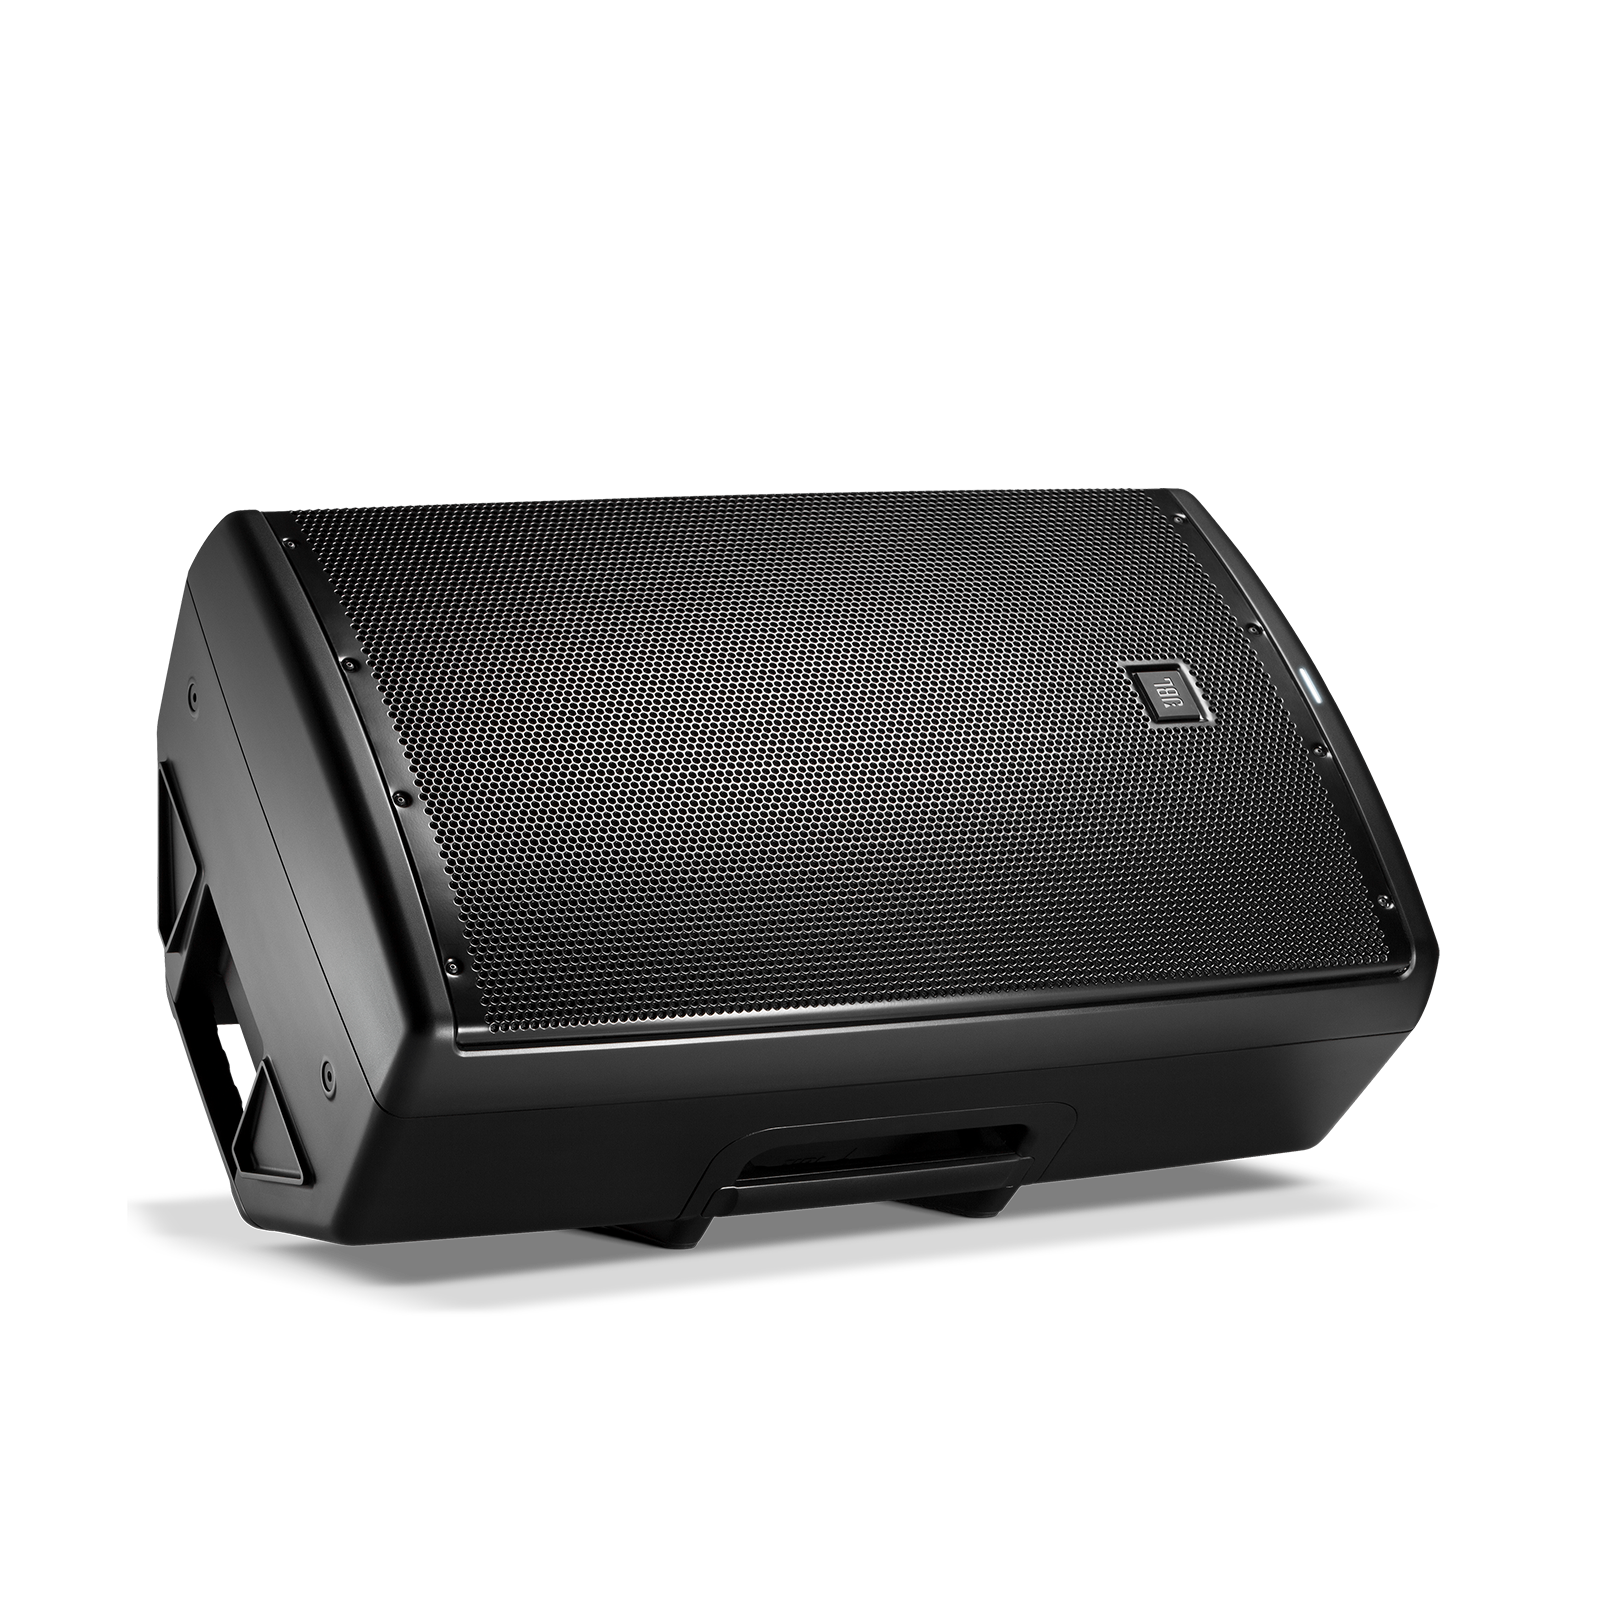 "JBL EON615 - Black - 15"" Two-Way Multipurpose Self-Powered Sound Reinforcement - Detailshot 3"